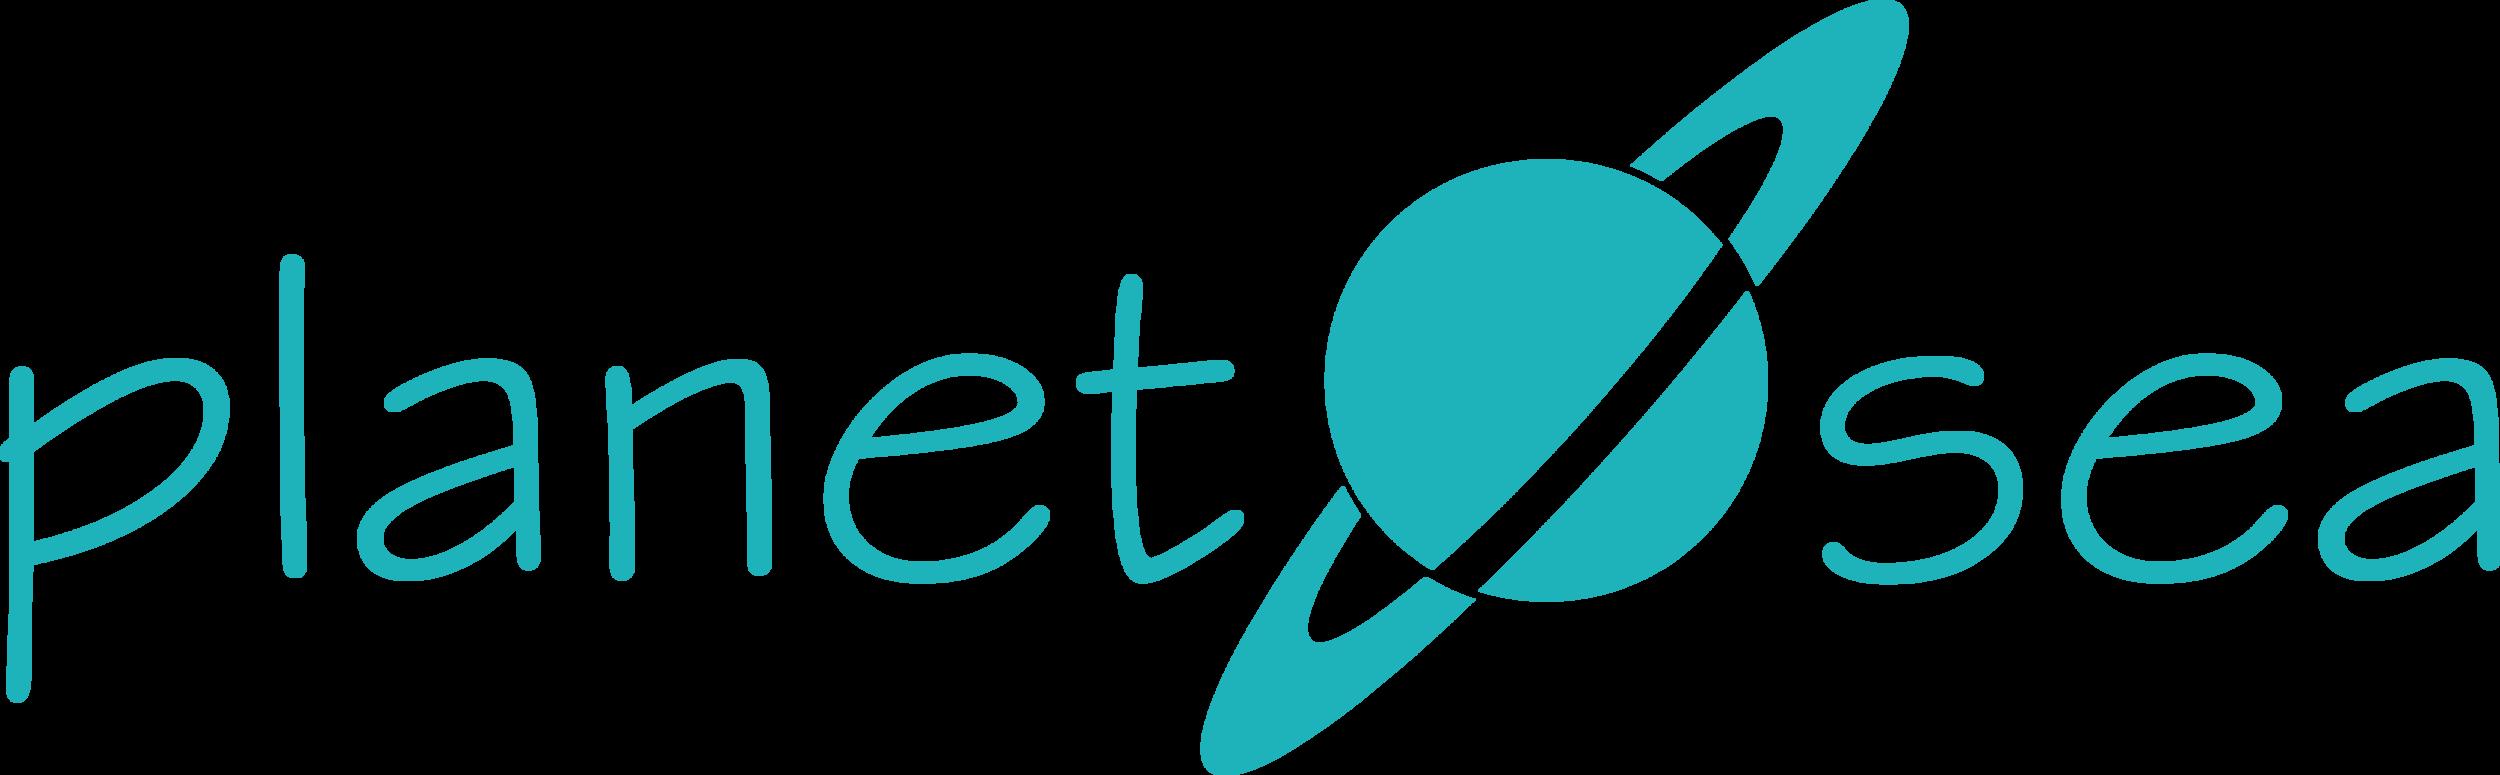 planet sea logo vector_teal.png